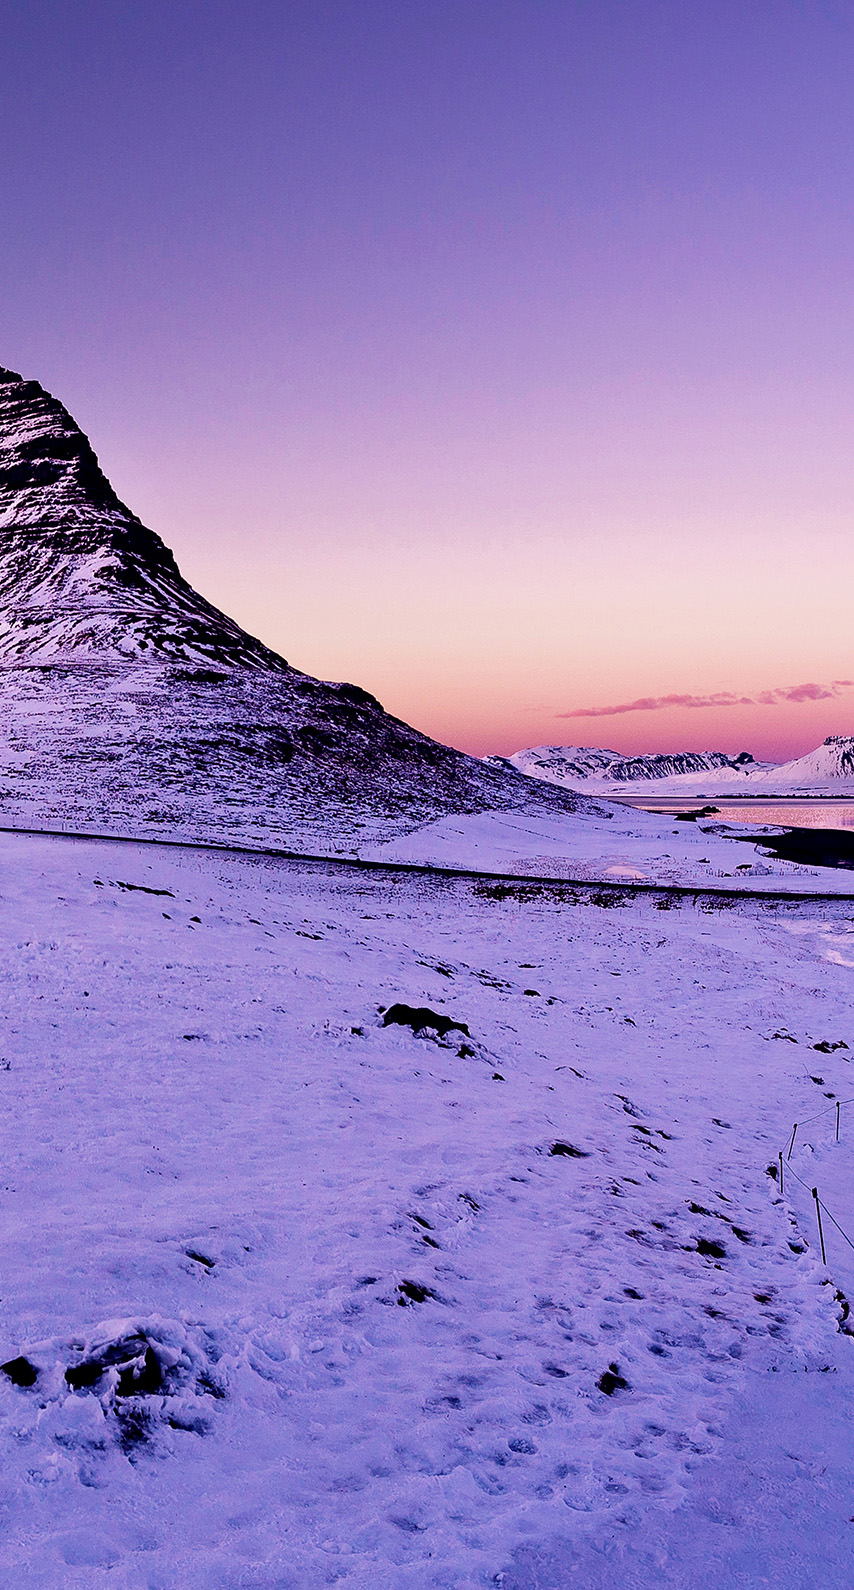 lake, snow, sunset, sunrise, rock, ice, mountain, morning, arctic, evening, no person, dawn